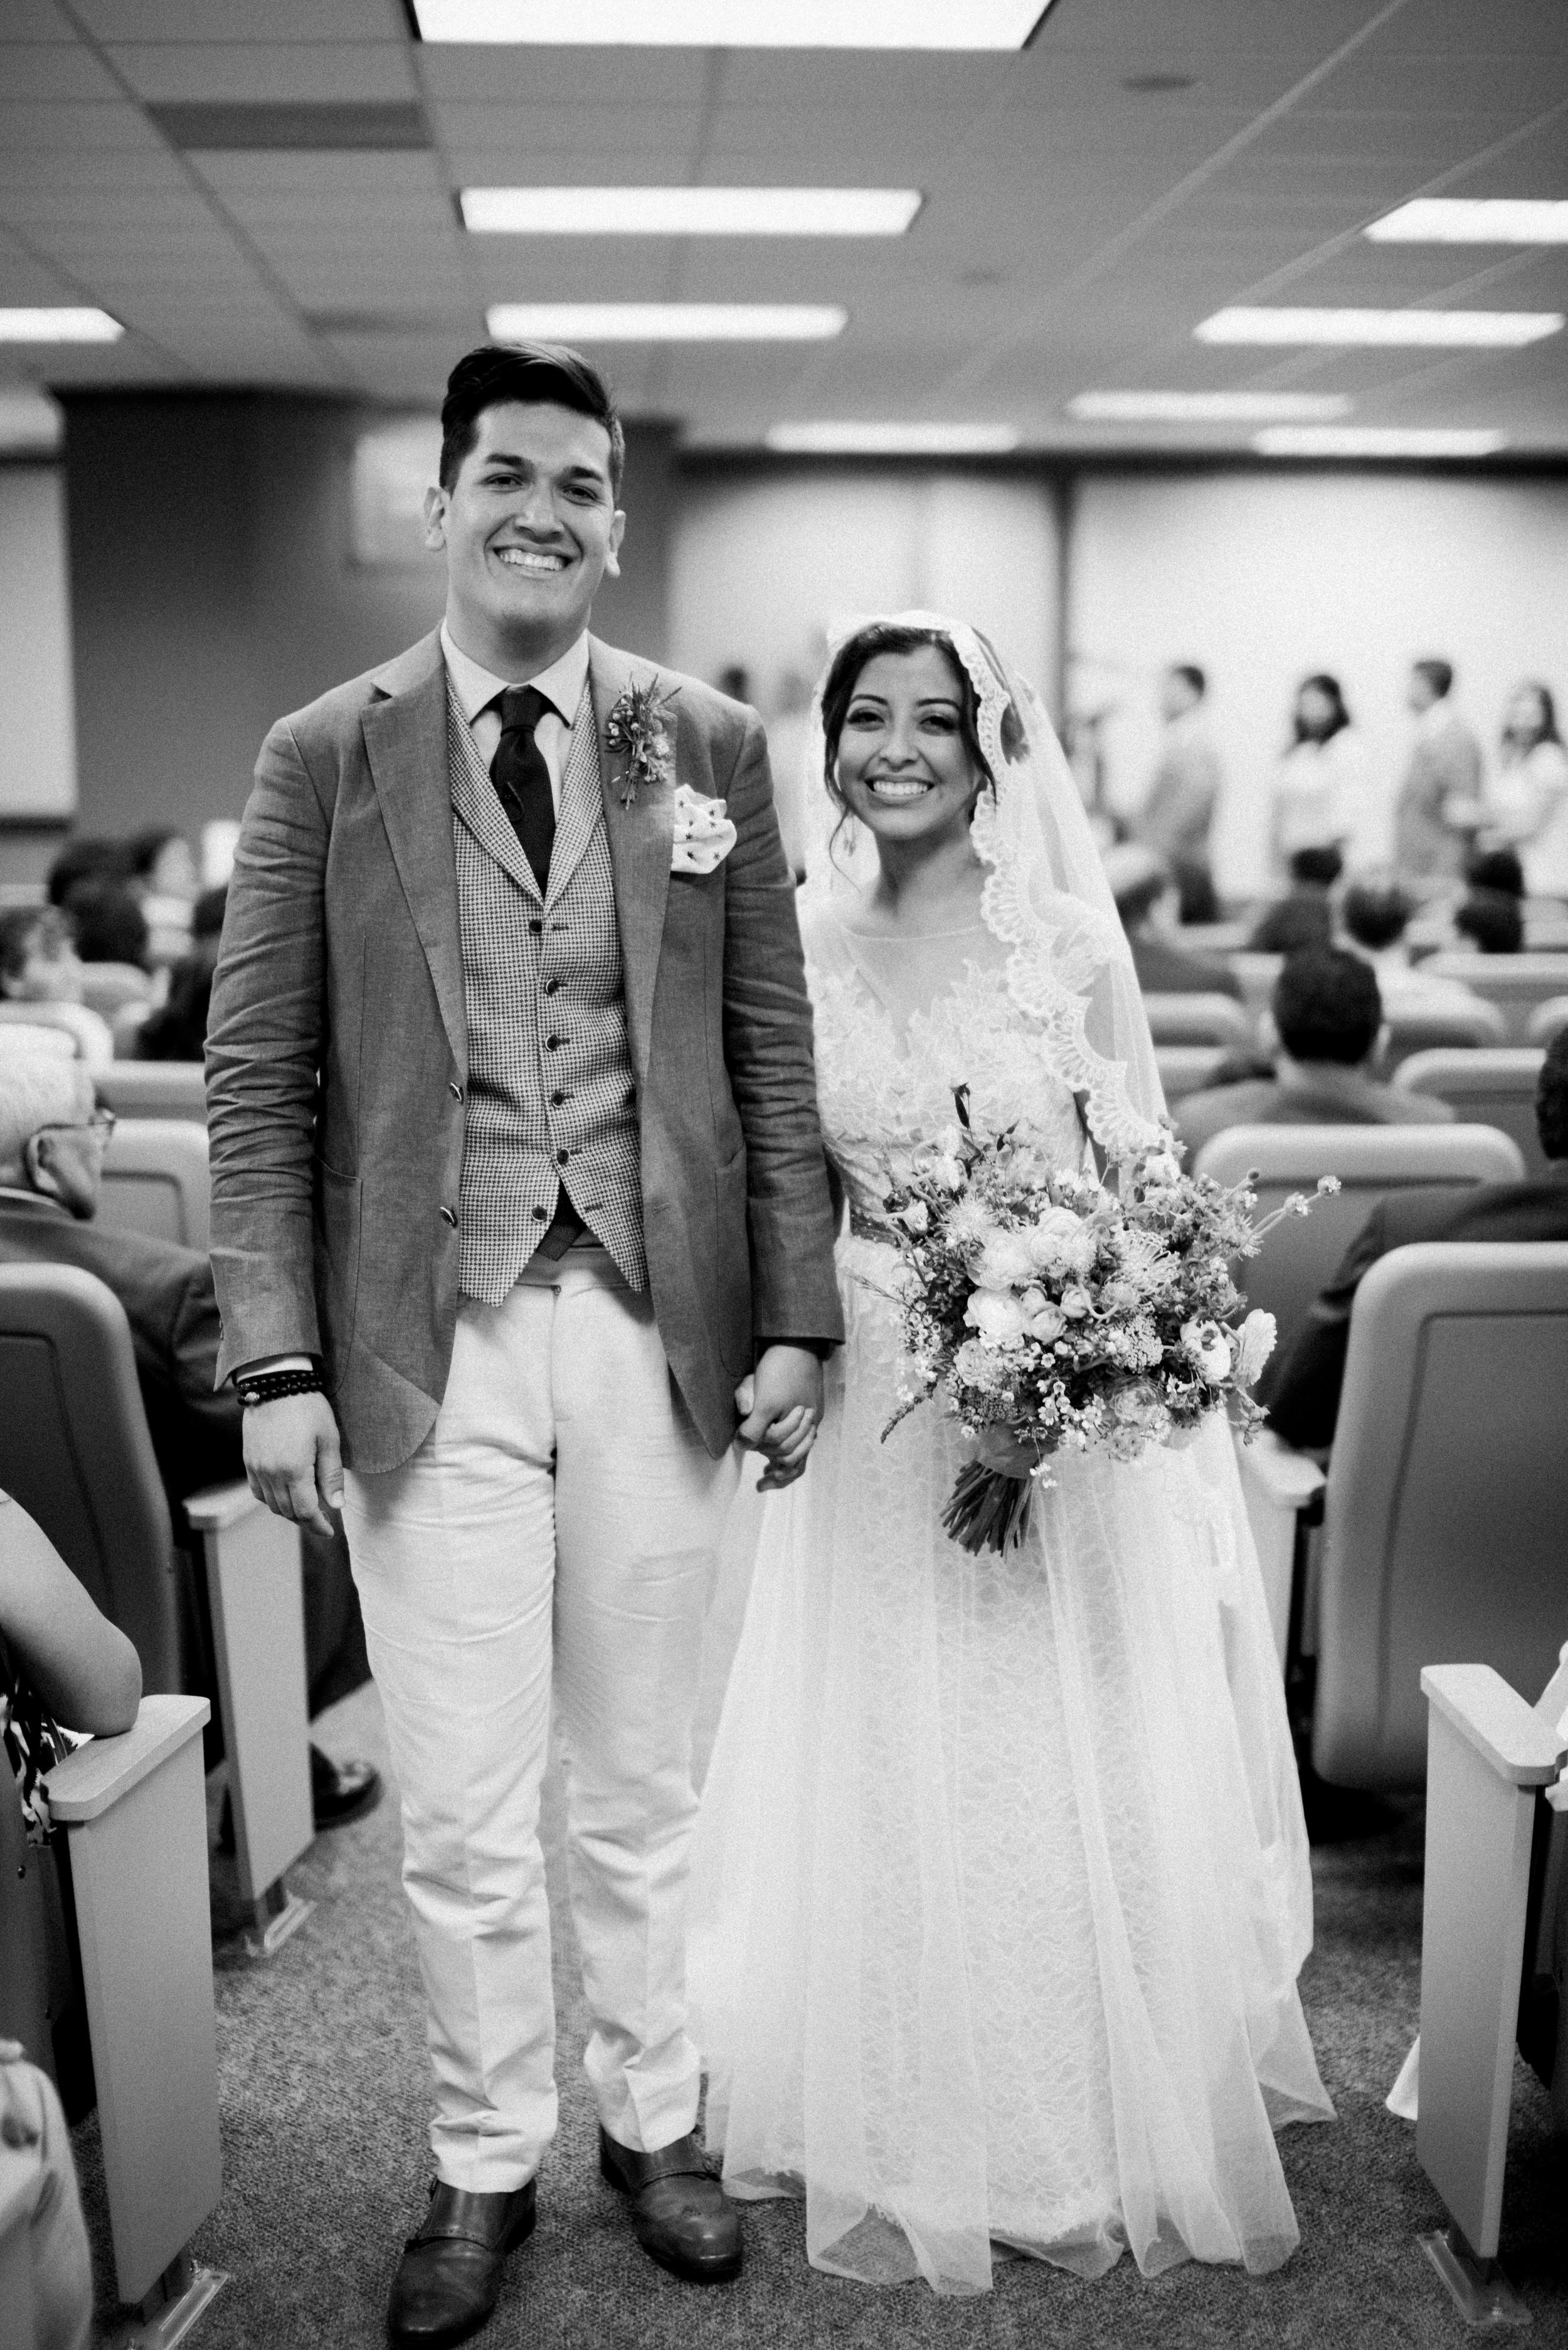 Dana-Fernandez-Photography-Martha-Stewart-Weddings-Houston-Texas-Wedding-Photographer-Film-36.jpg